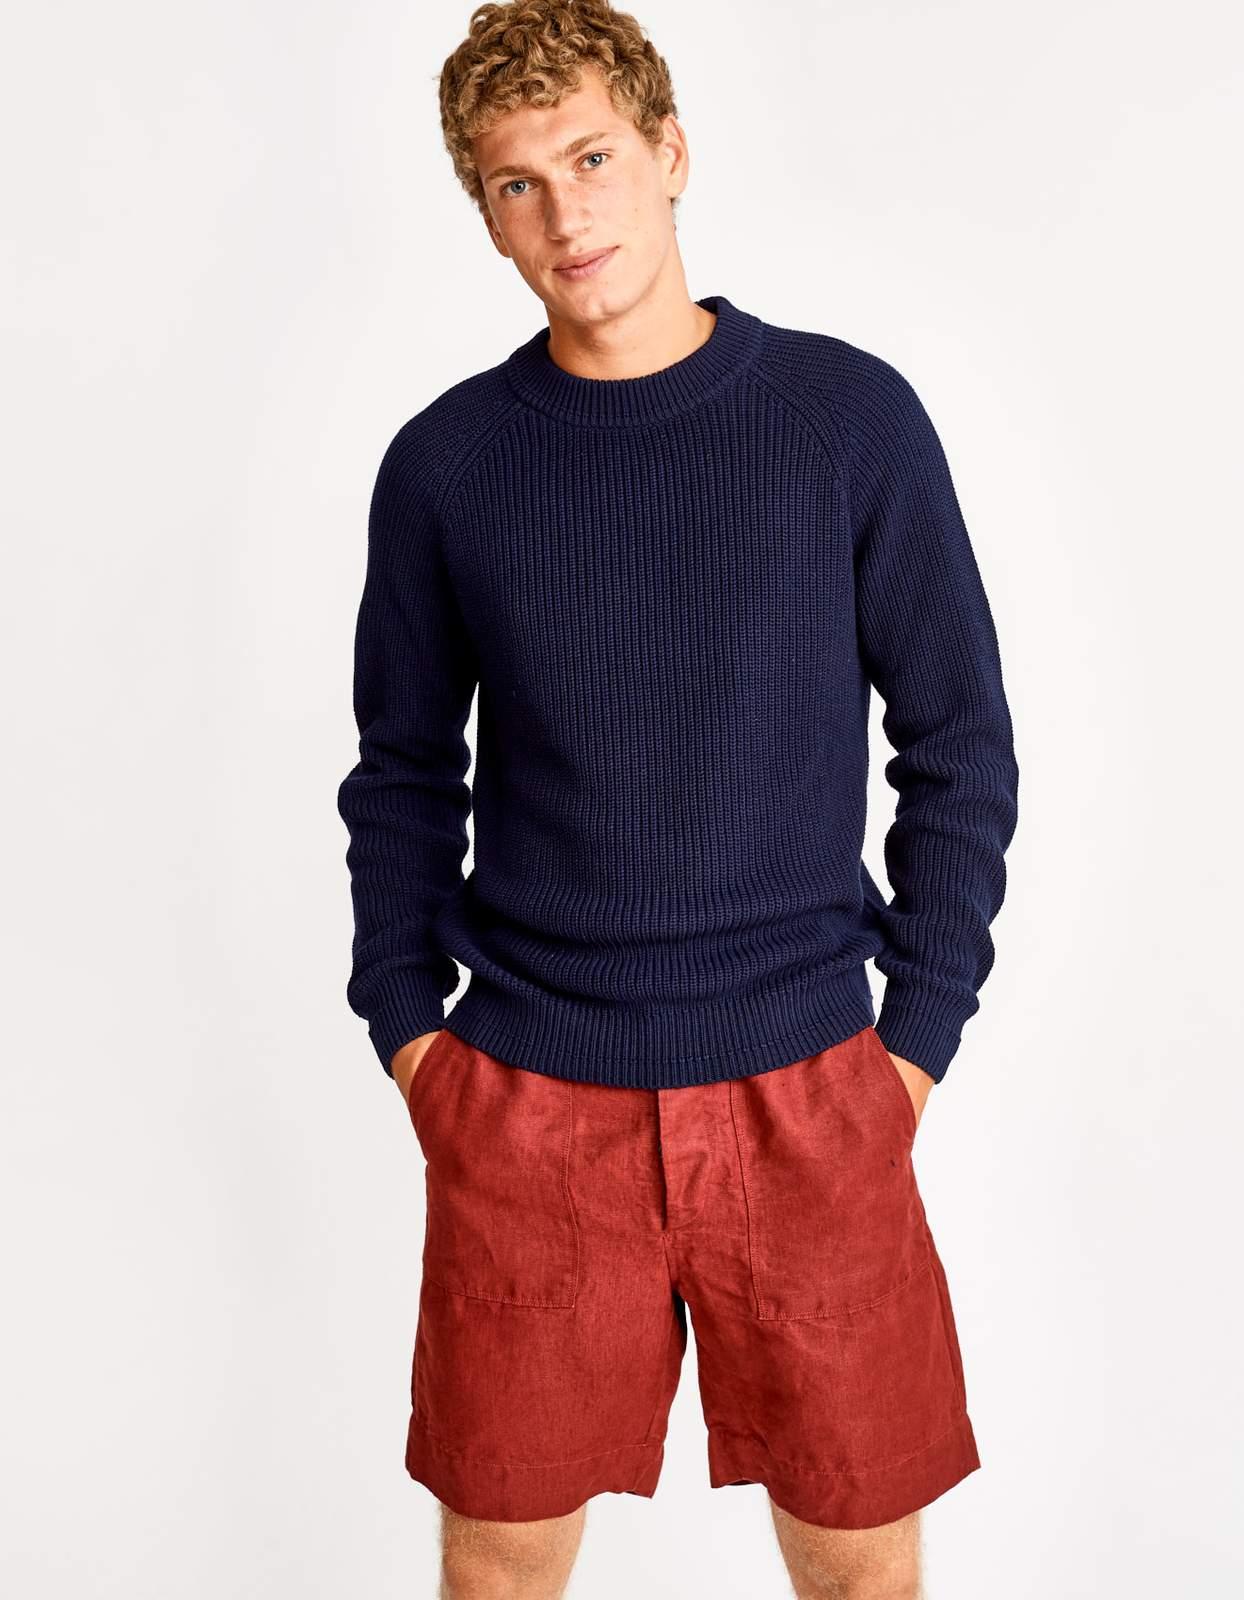 BLR-knitwear-daimer-k0877u-navy_8_1_1600x1600.jpg